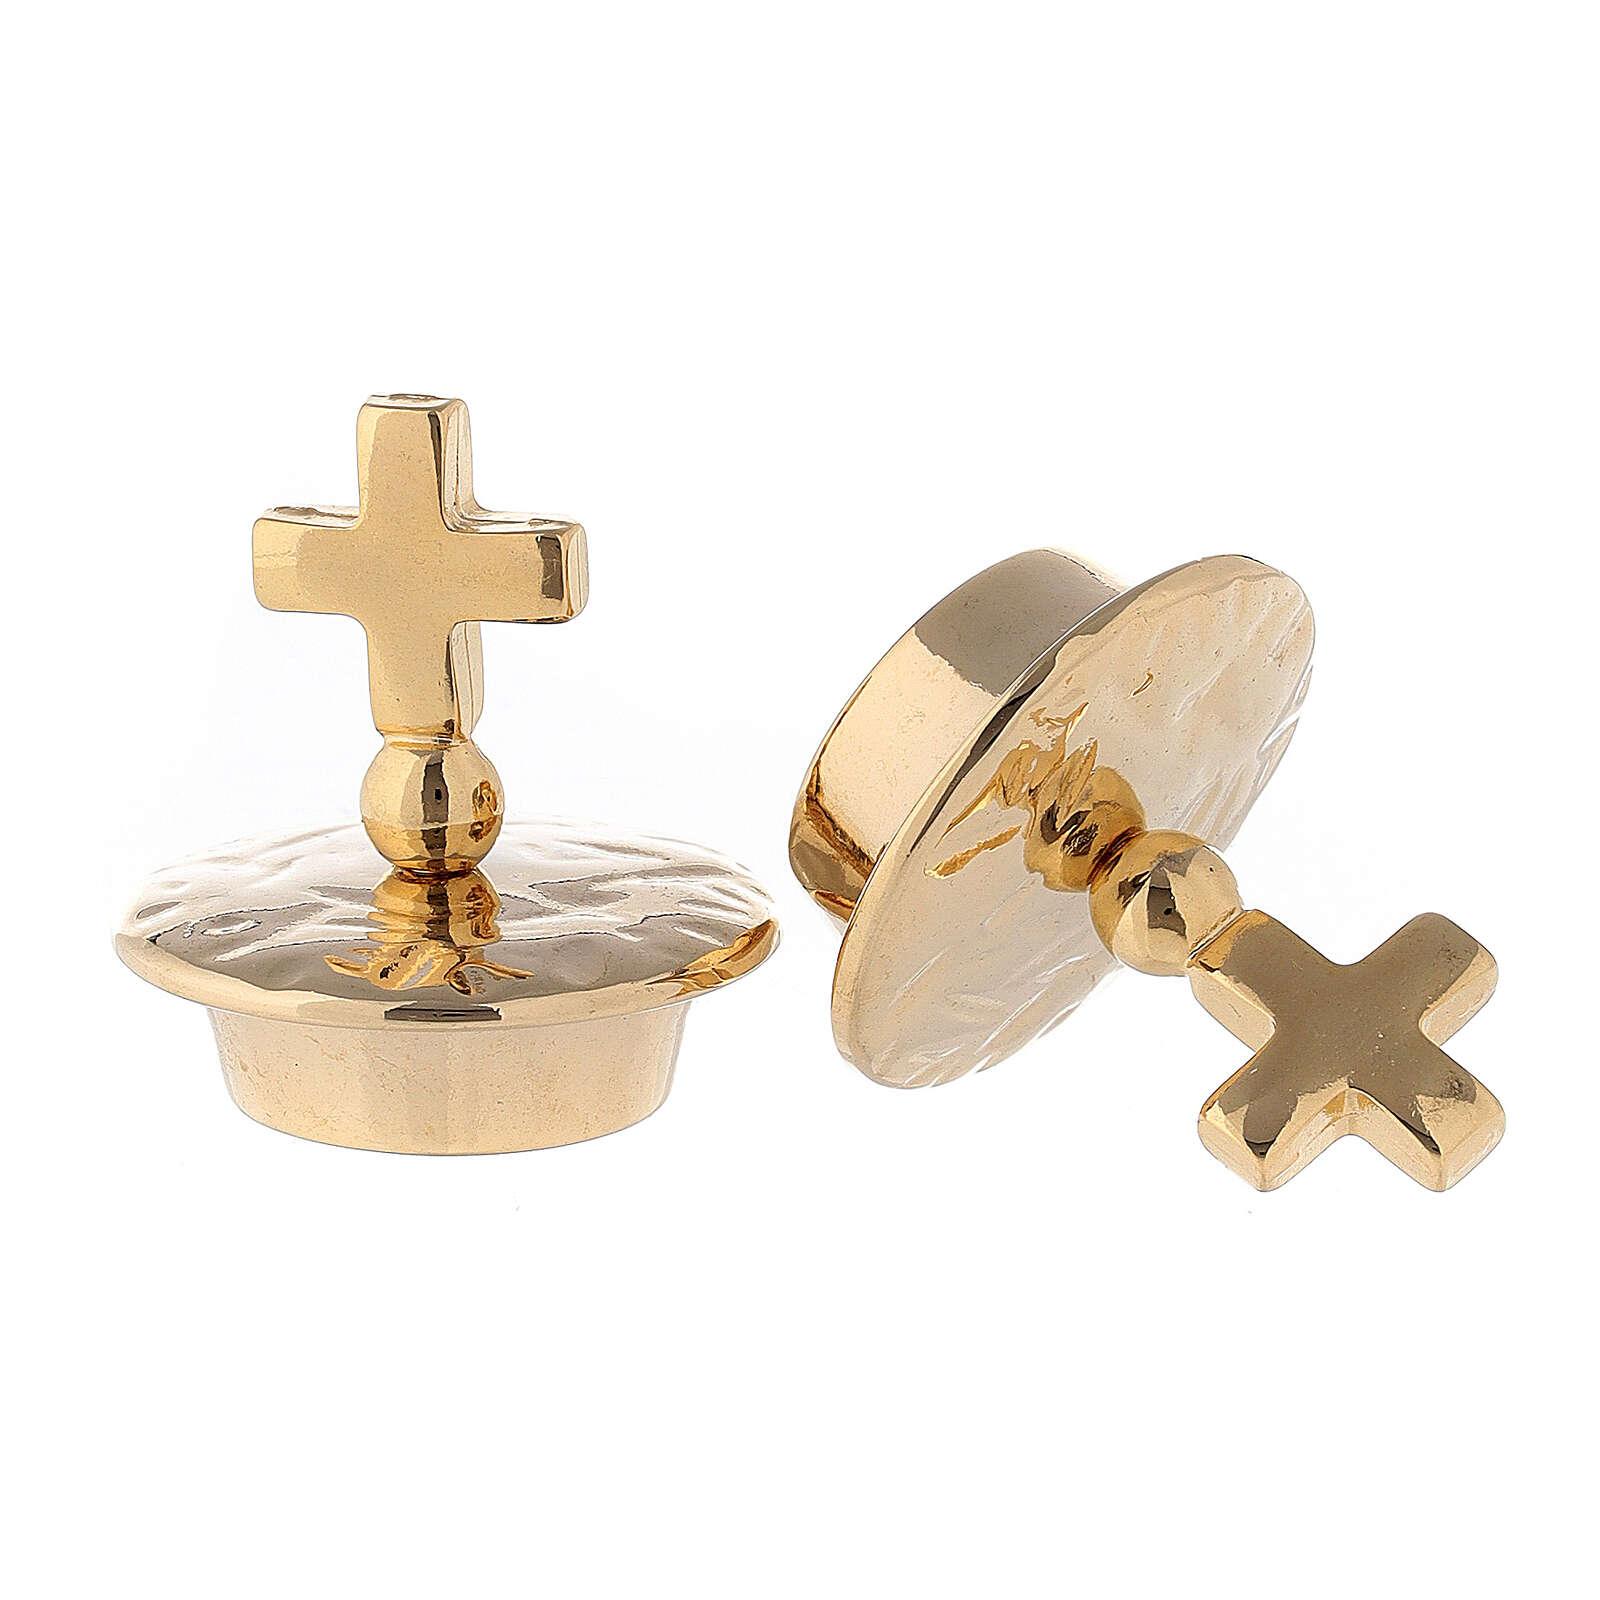 Pareja tapones cruz simple para vinajeras mod. Venecia-Roma 4